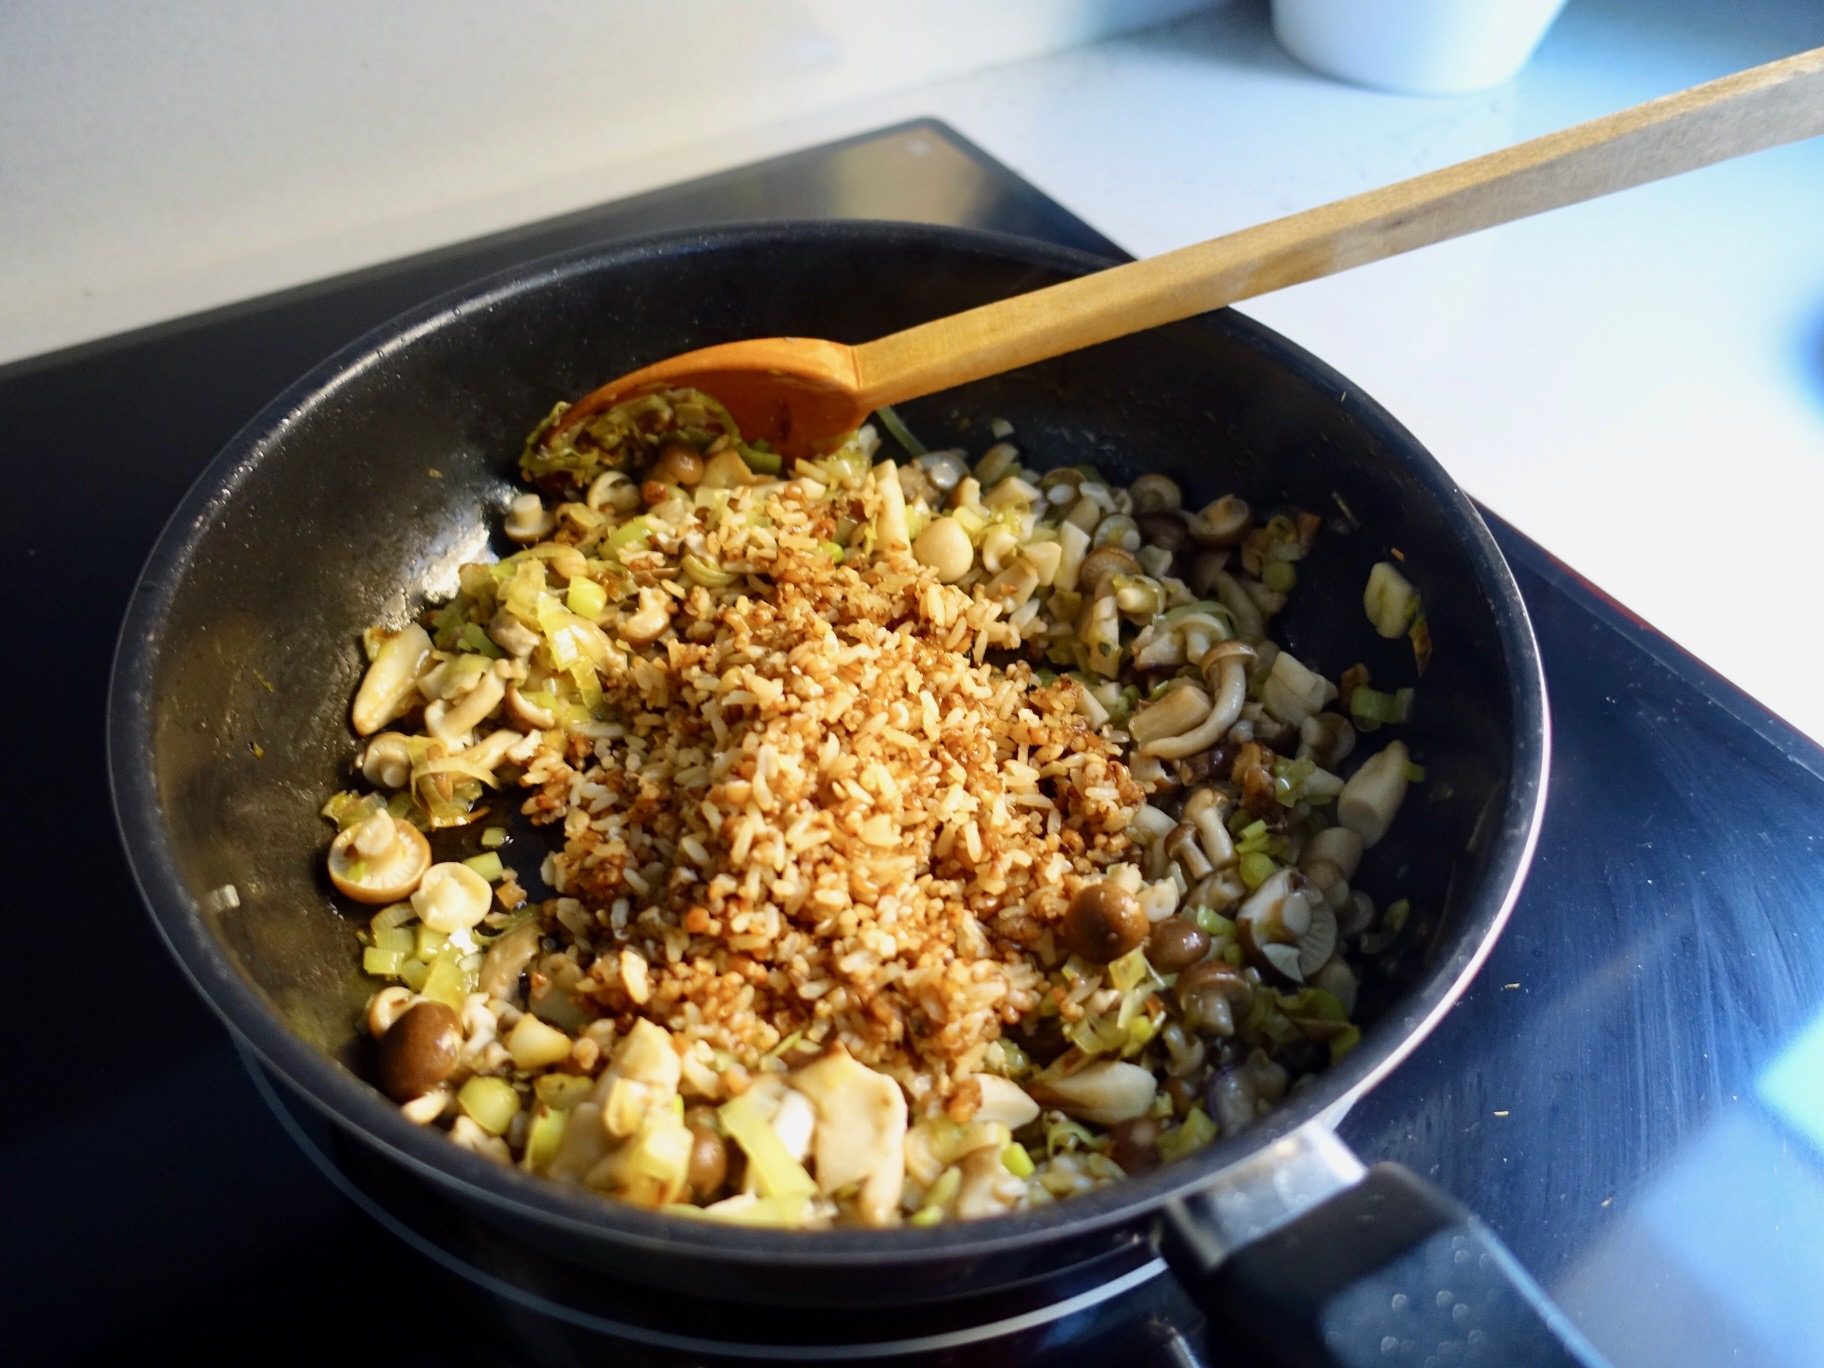 arroz quinoa receta paula butragueño